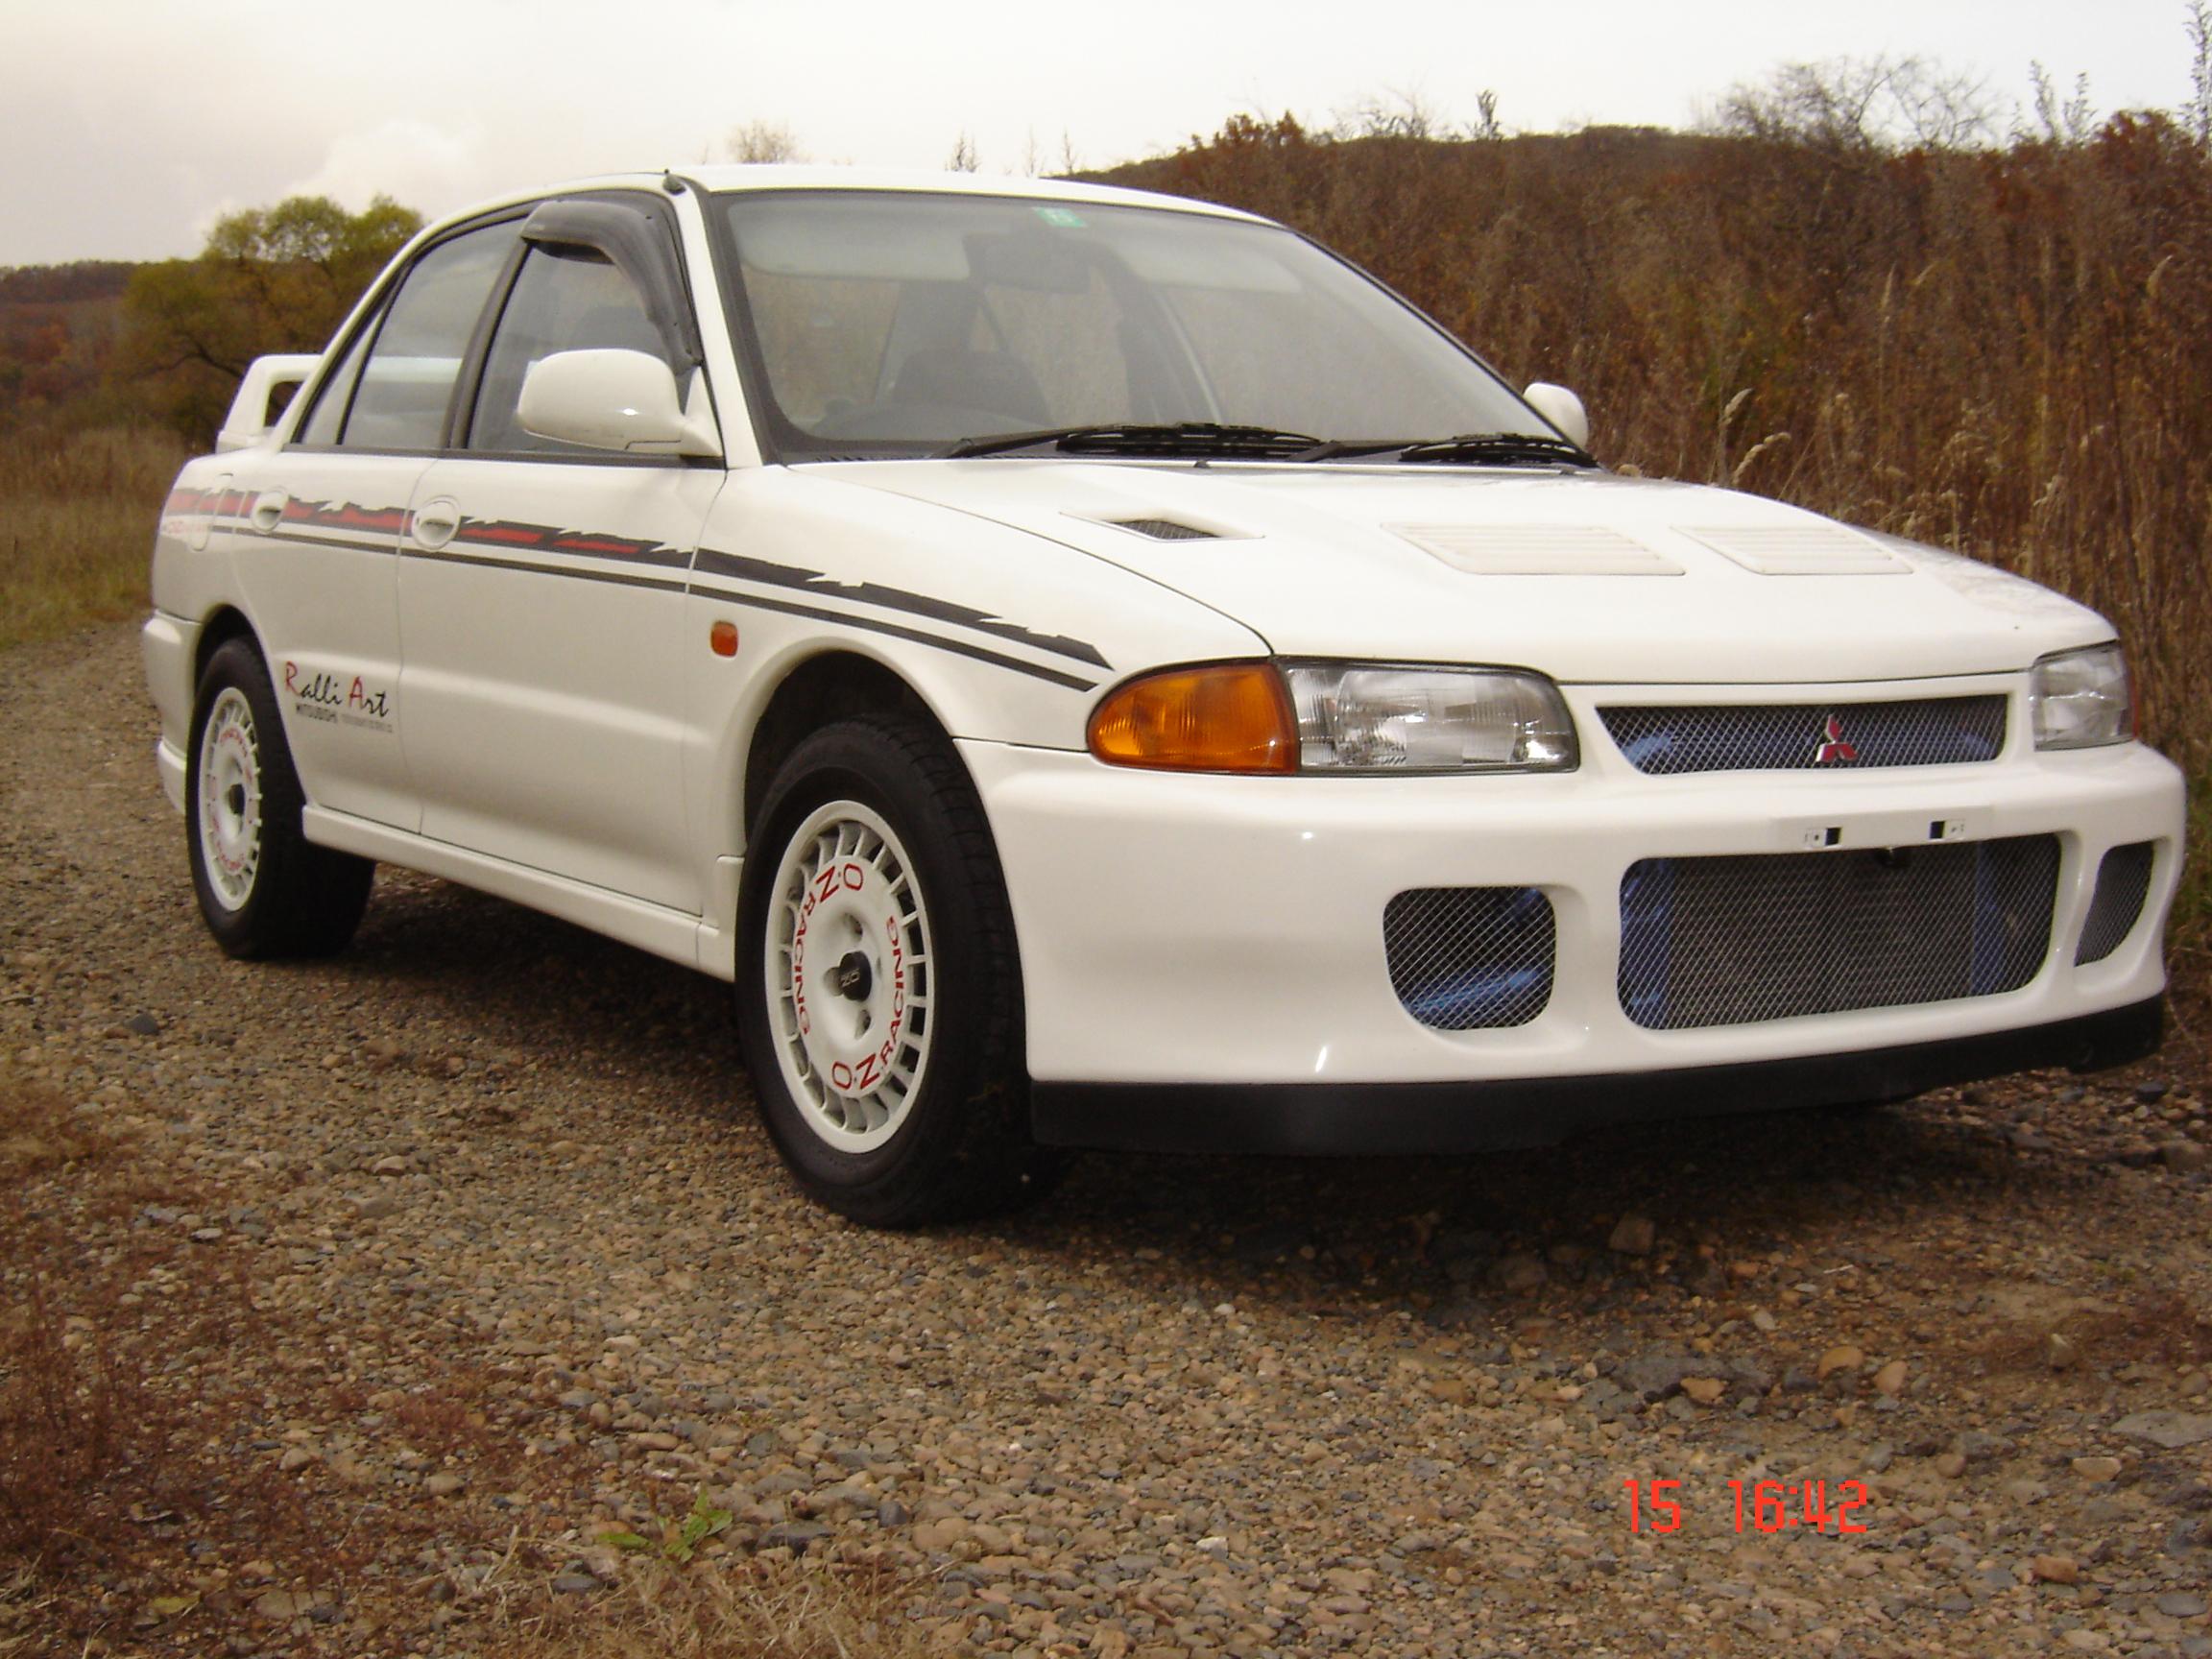 Тюнинг Mitsubishi Lancer Evo I sedan 1992, фото тюнинга